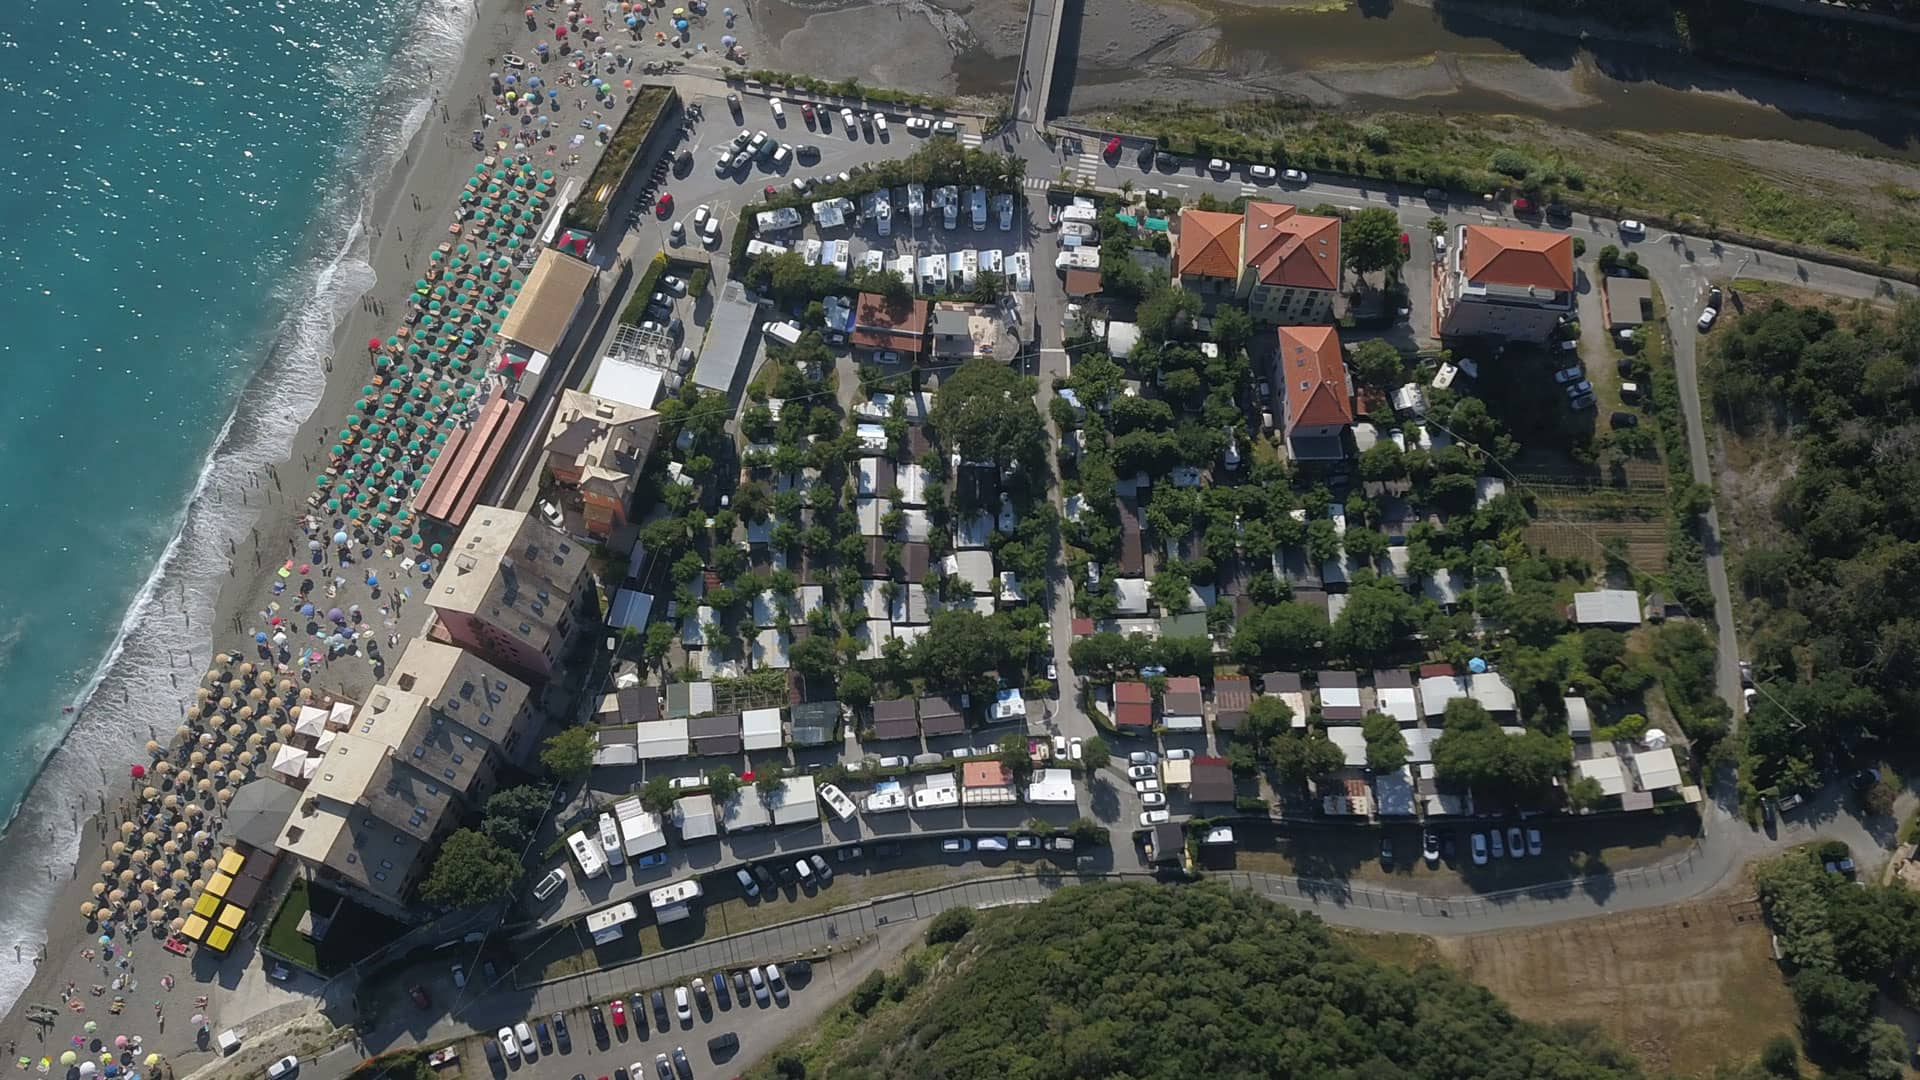 Camping Fornaci al mare a Deiva Marina in Liguria - camping Deiva Marina